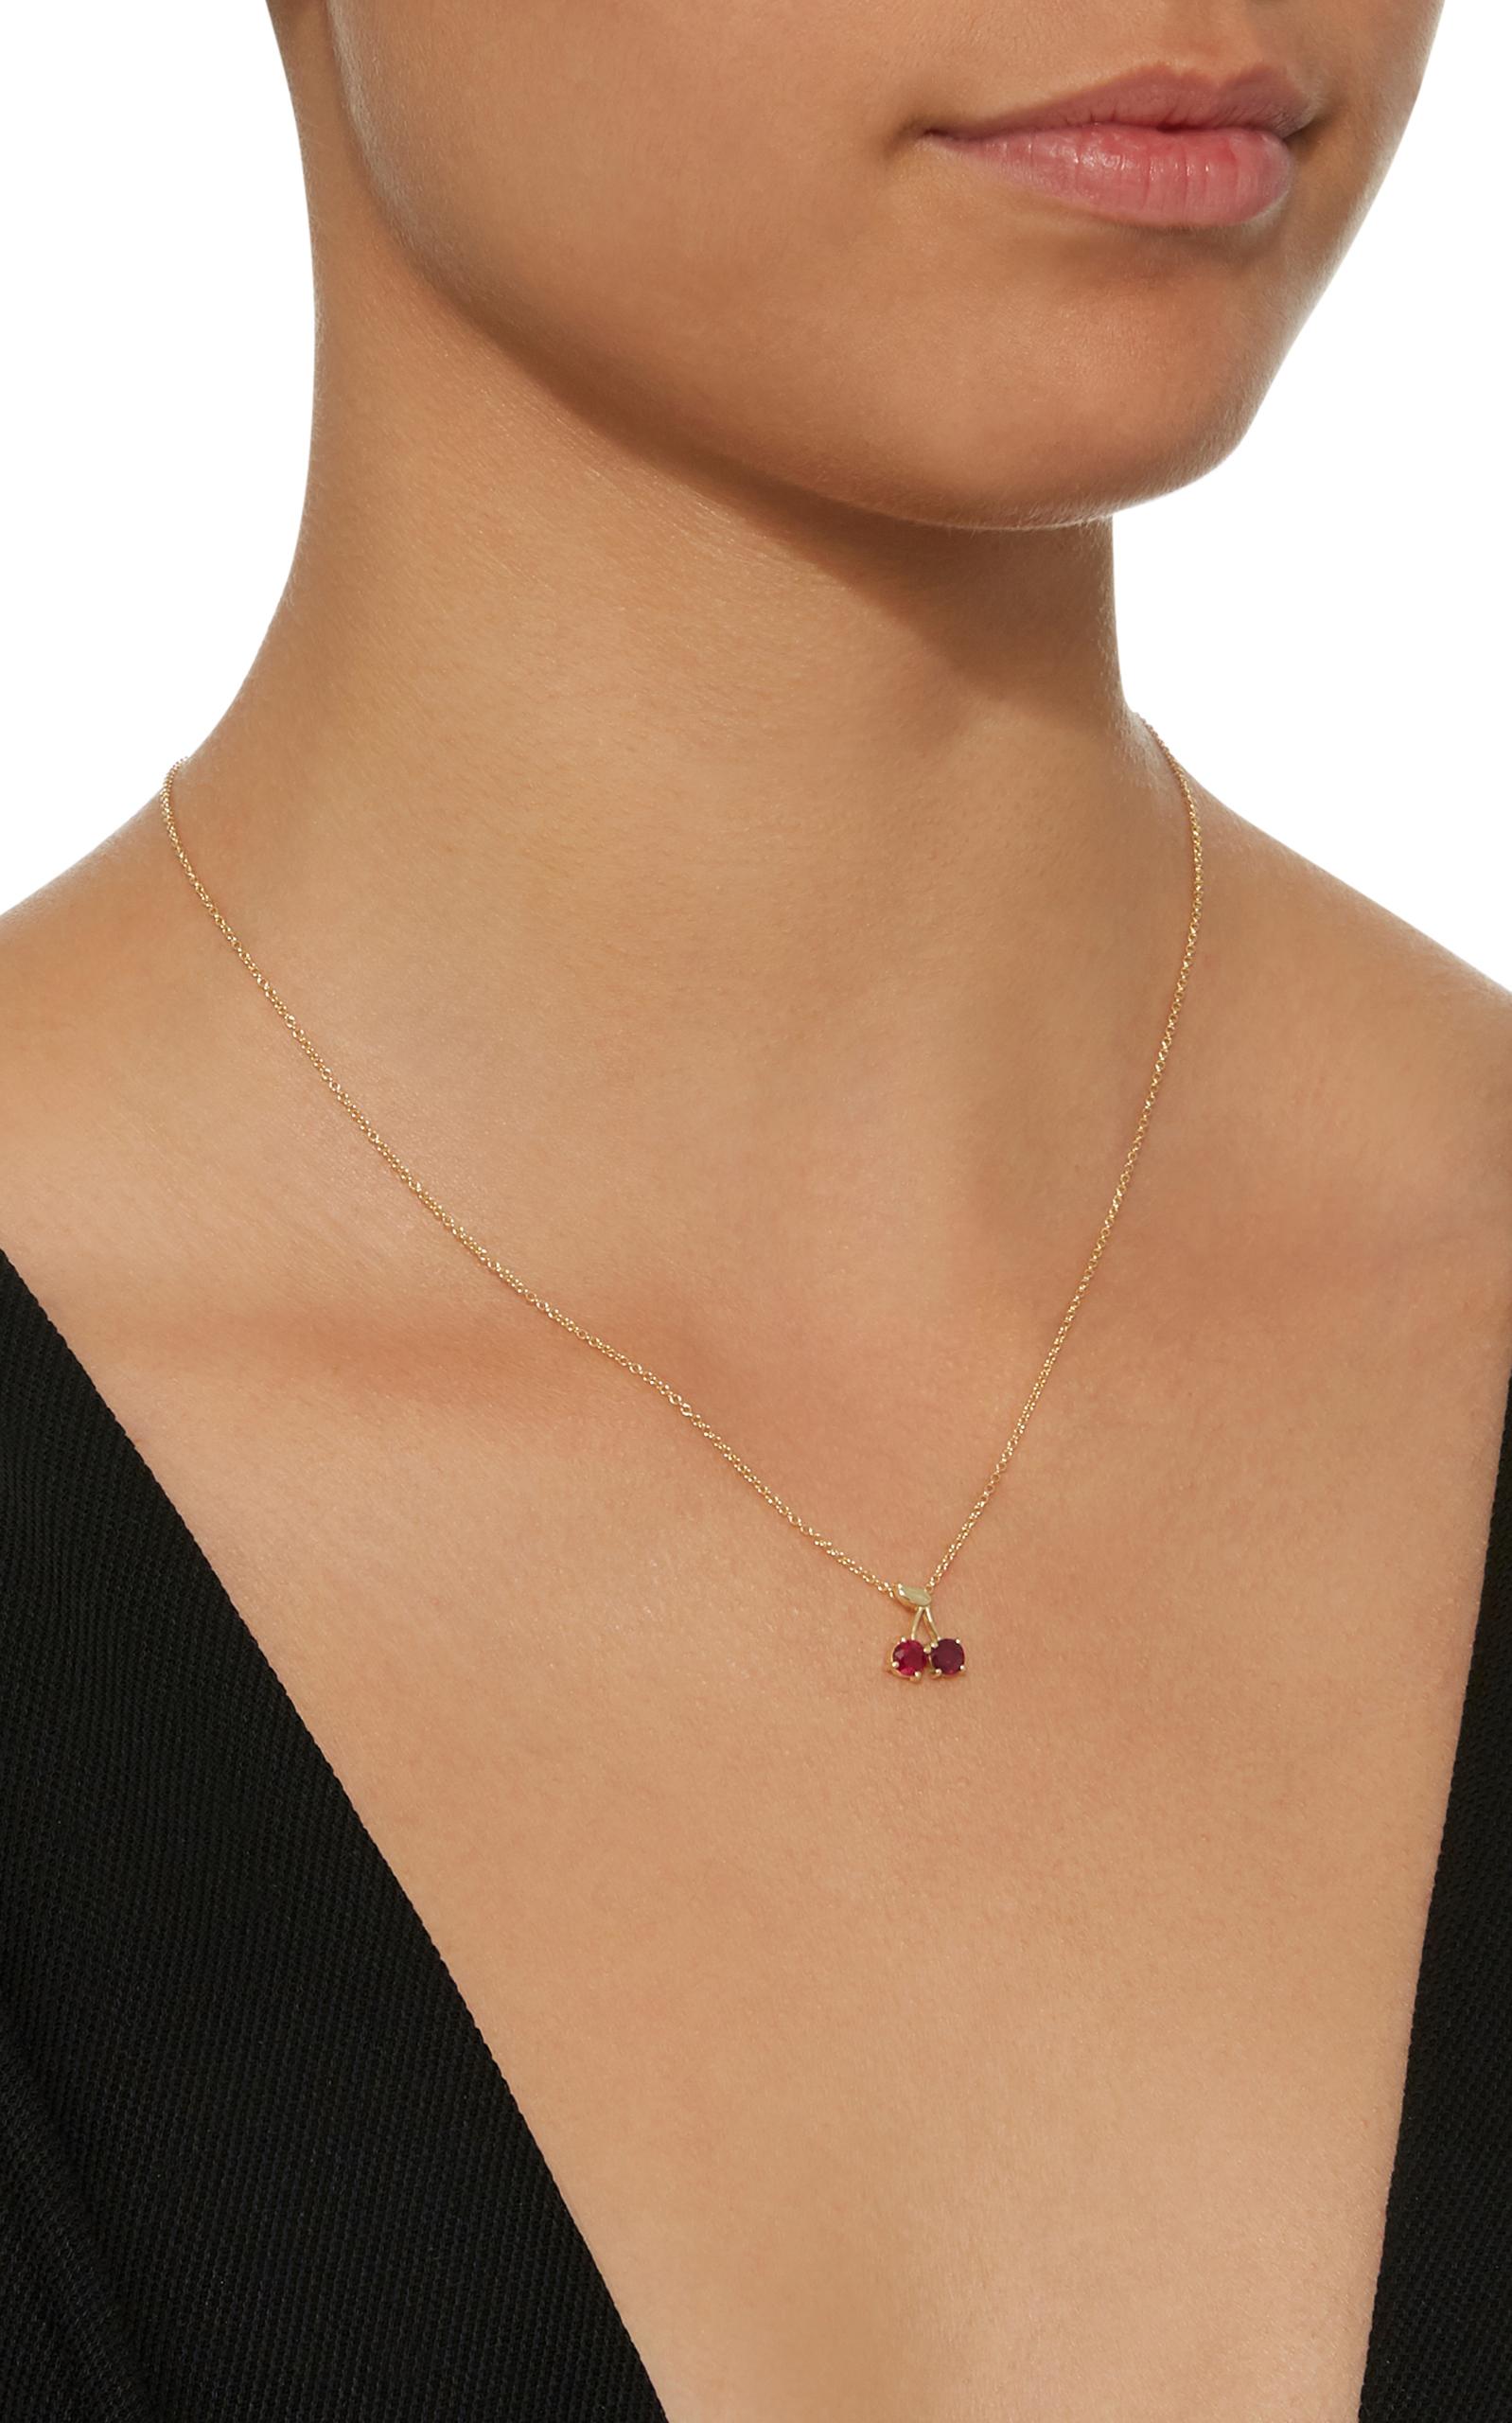 Cherry Charm 18K Gold Ruby Earrings Established SaVhB